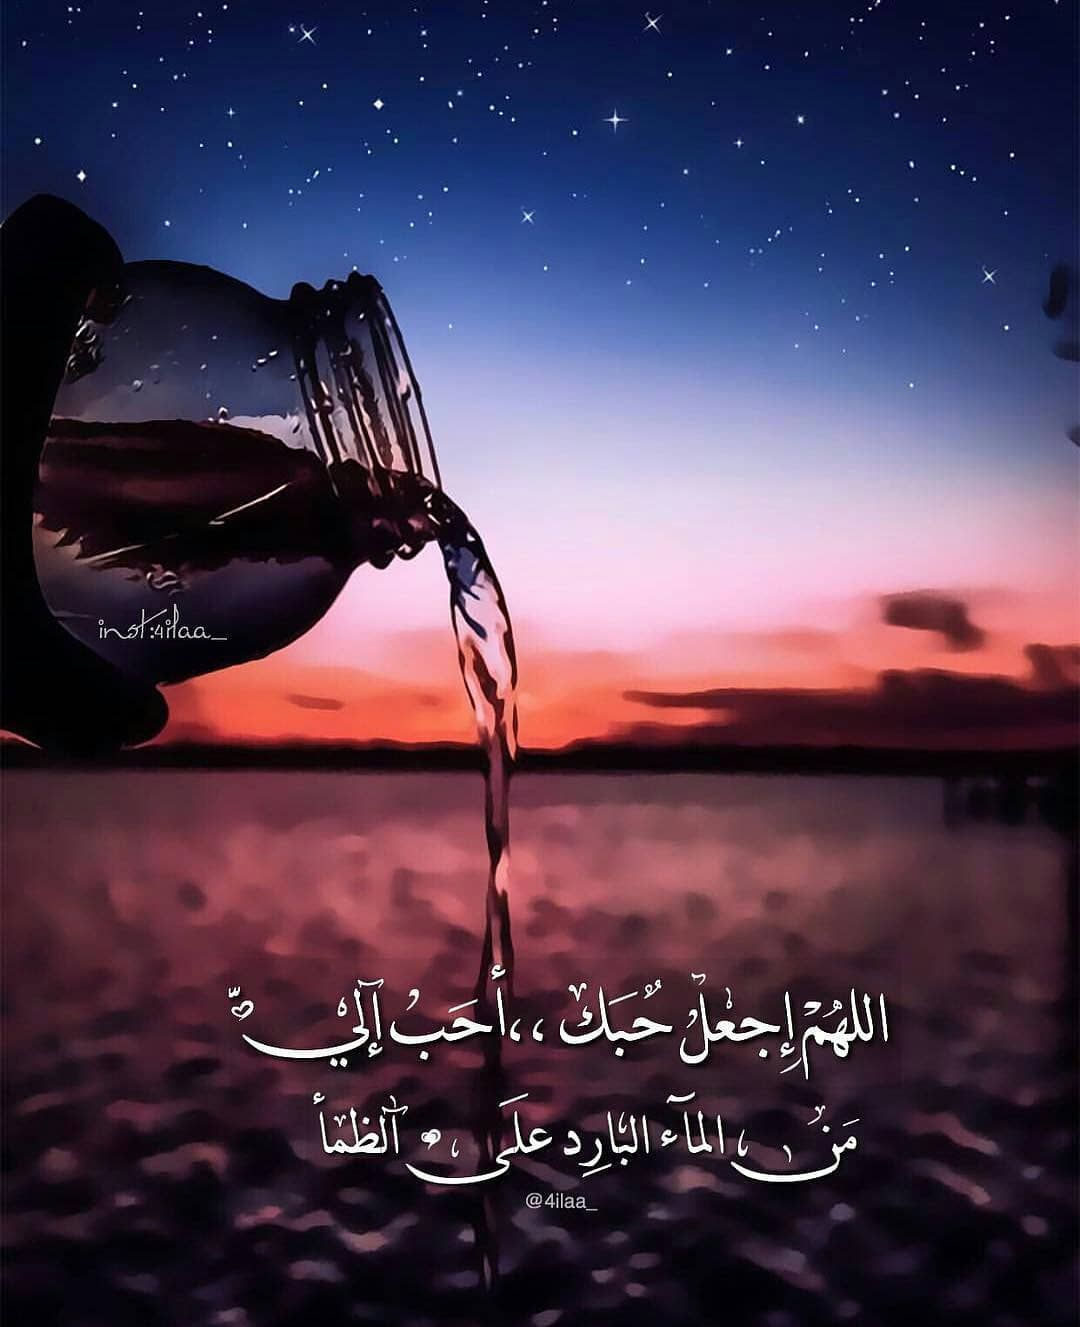 4ilaa آل ل ه ہ م ـ آج ع ل حب گ آحب آل يـﮯ م ـن آل م ـآ آل ب آرد ع ل آل ظ ـم ـ آ Beautiful Quran Quotes Ramadan Quotes Islamic Love Quotes